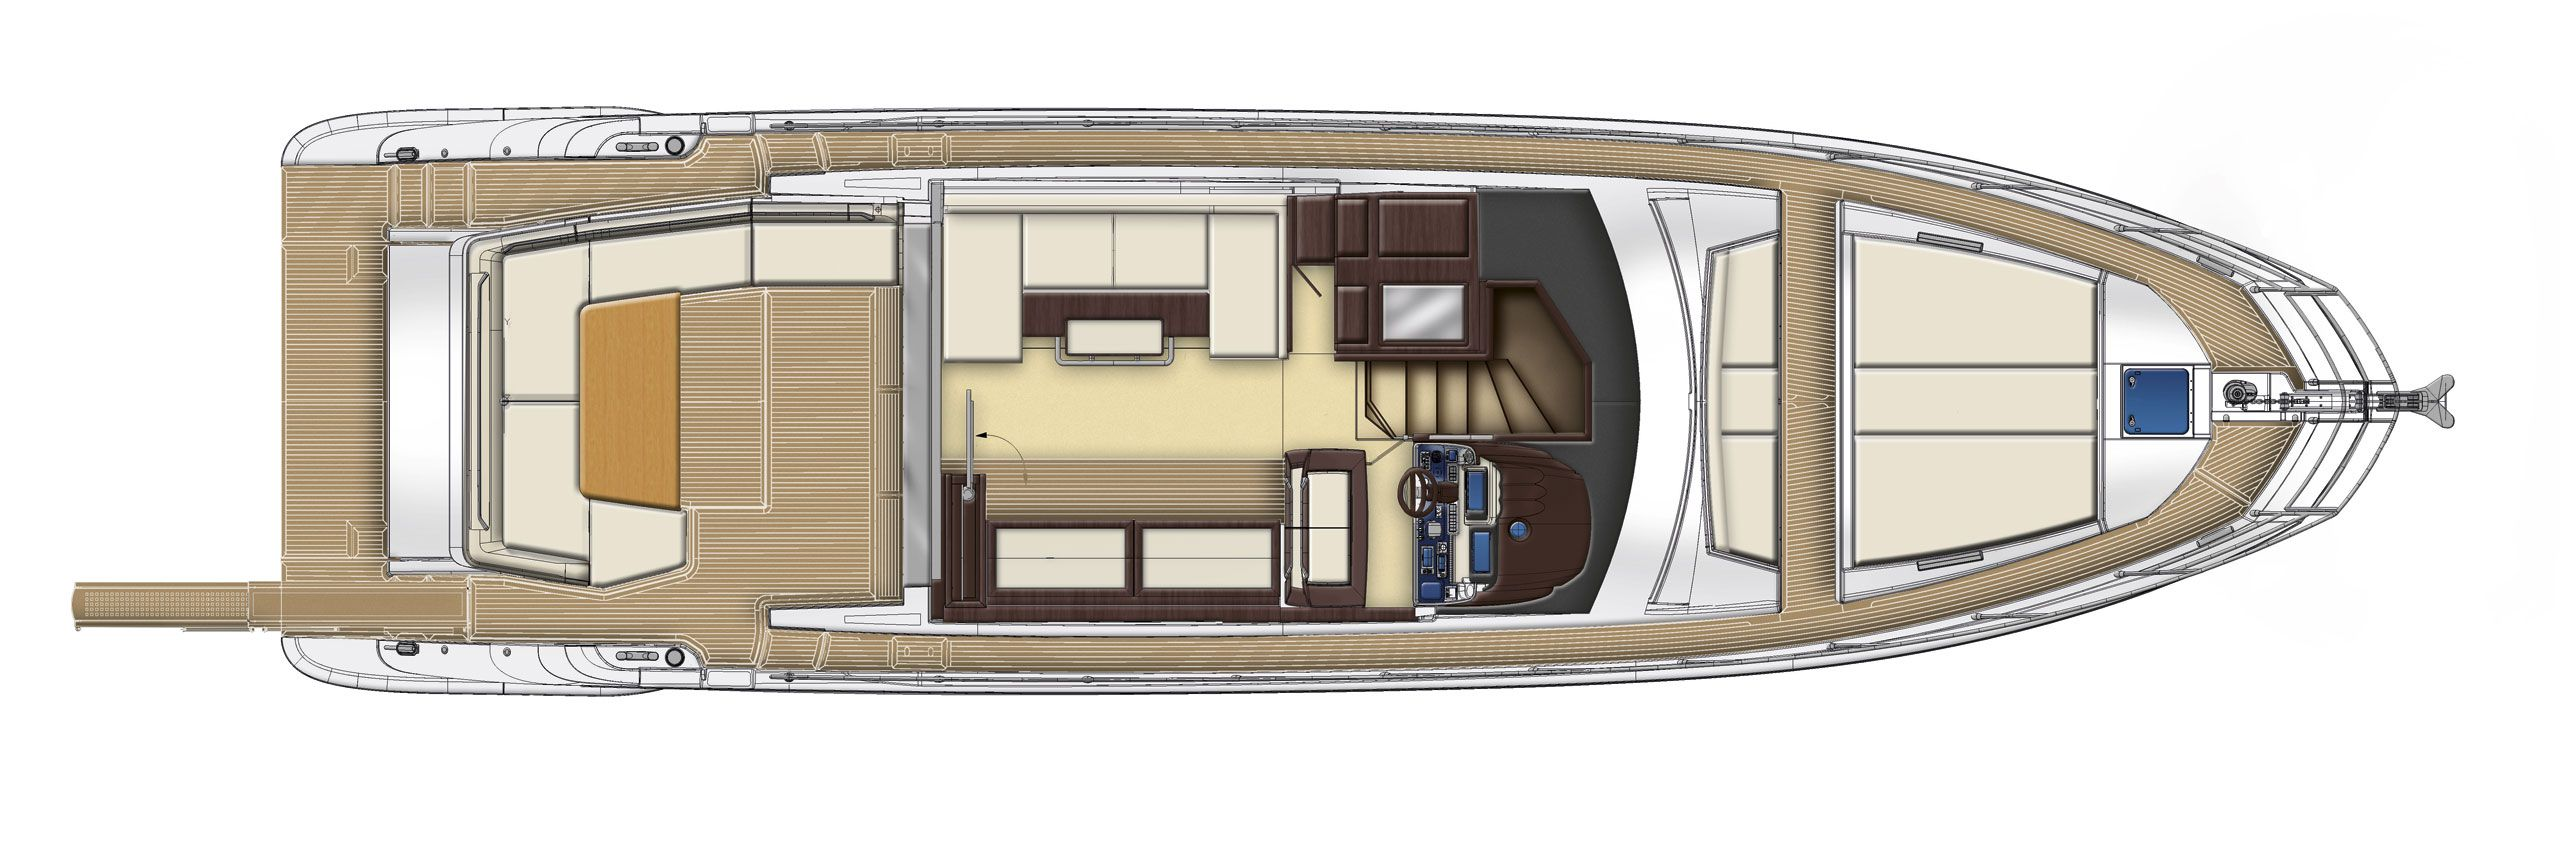 Azimut 55 s cs yachting for Innenarchitekt yacht